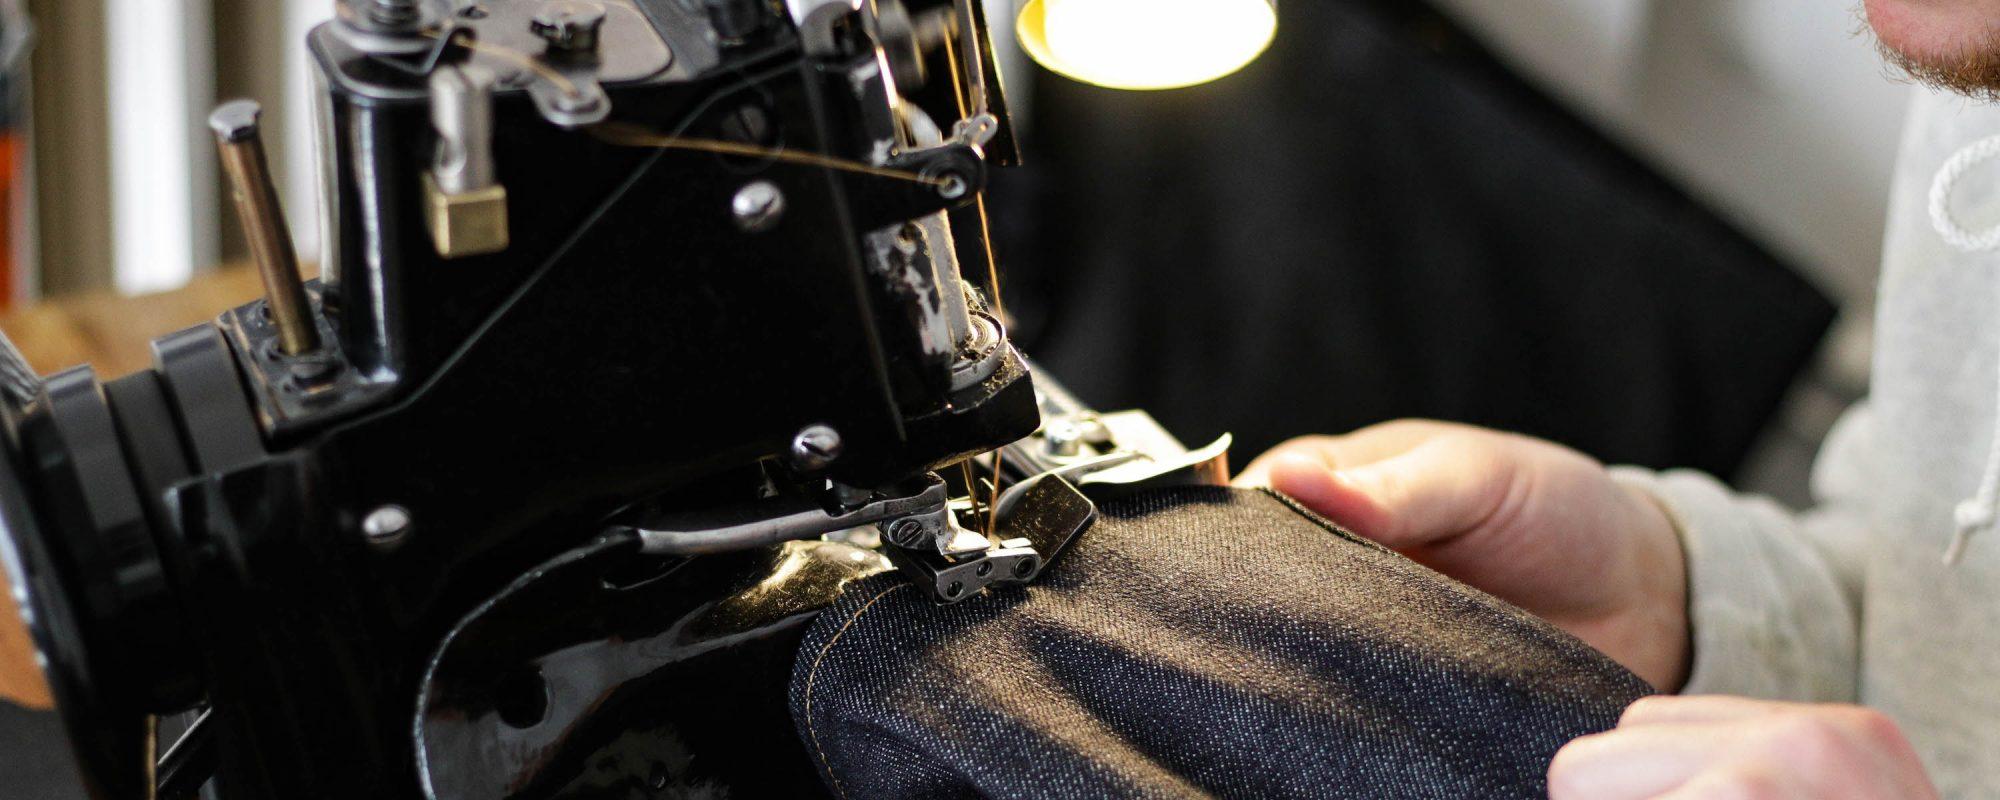 chain stitch union special 42300 G Bulldog